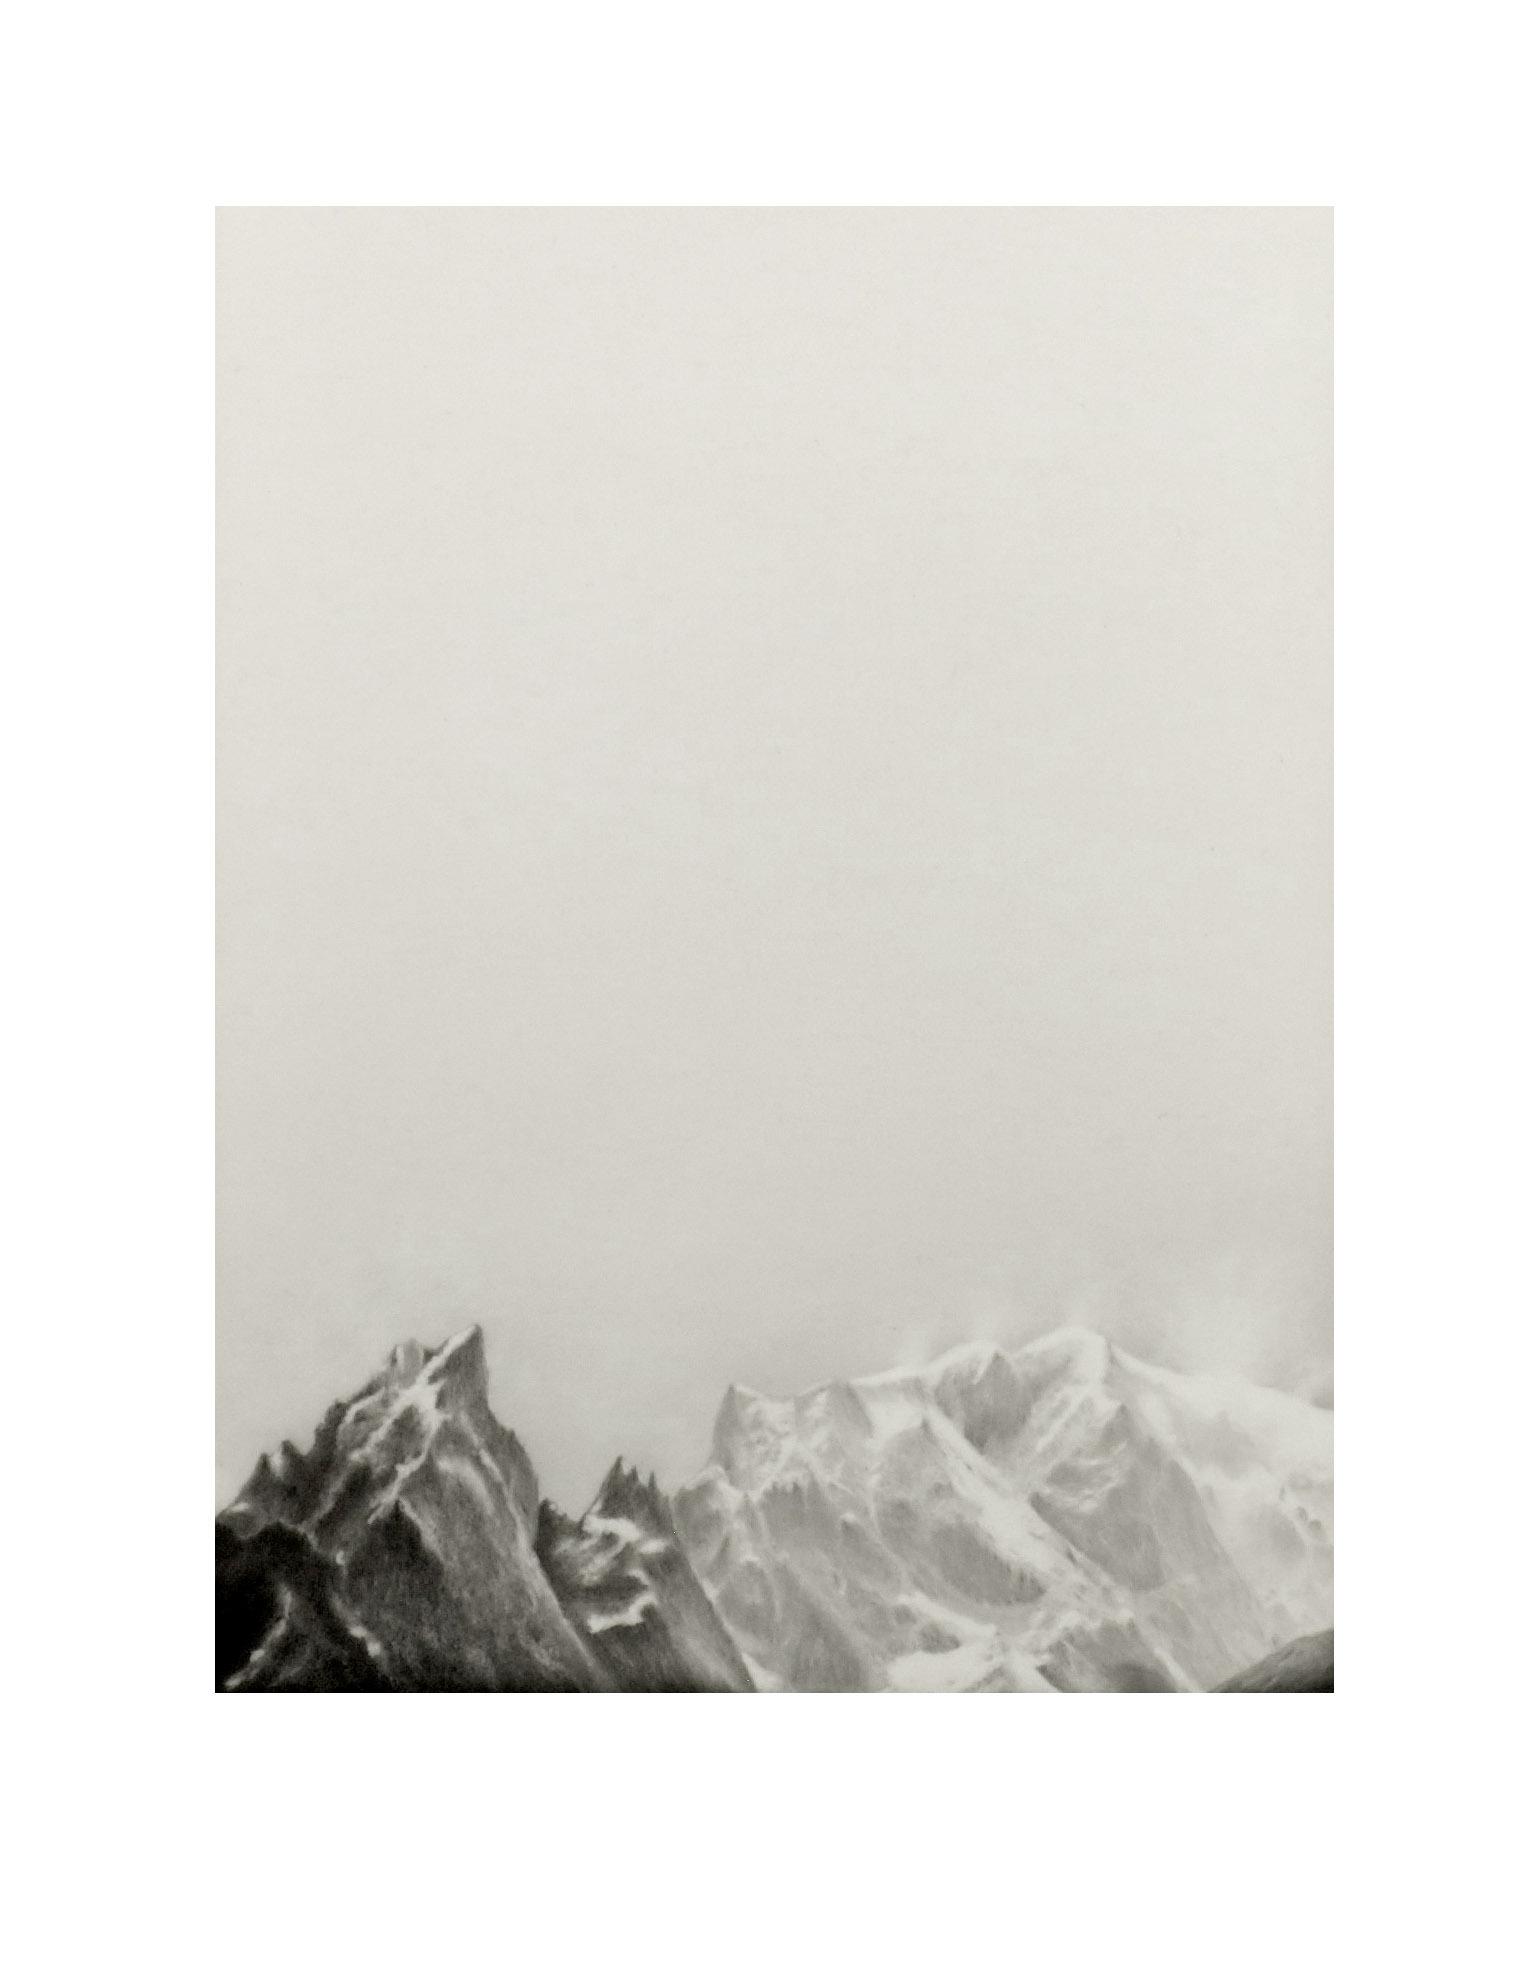 Mont Blanc # 3 (Detail)